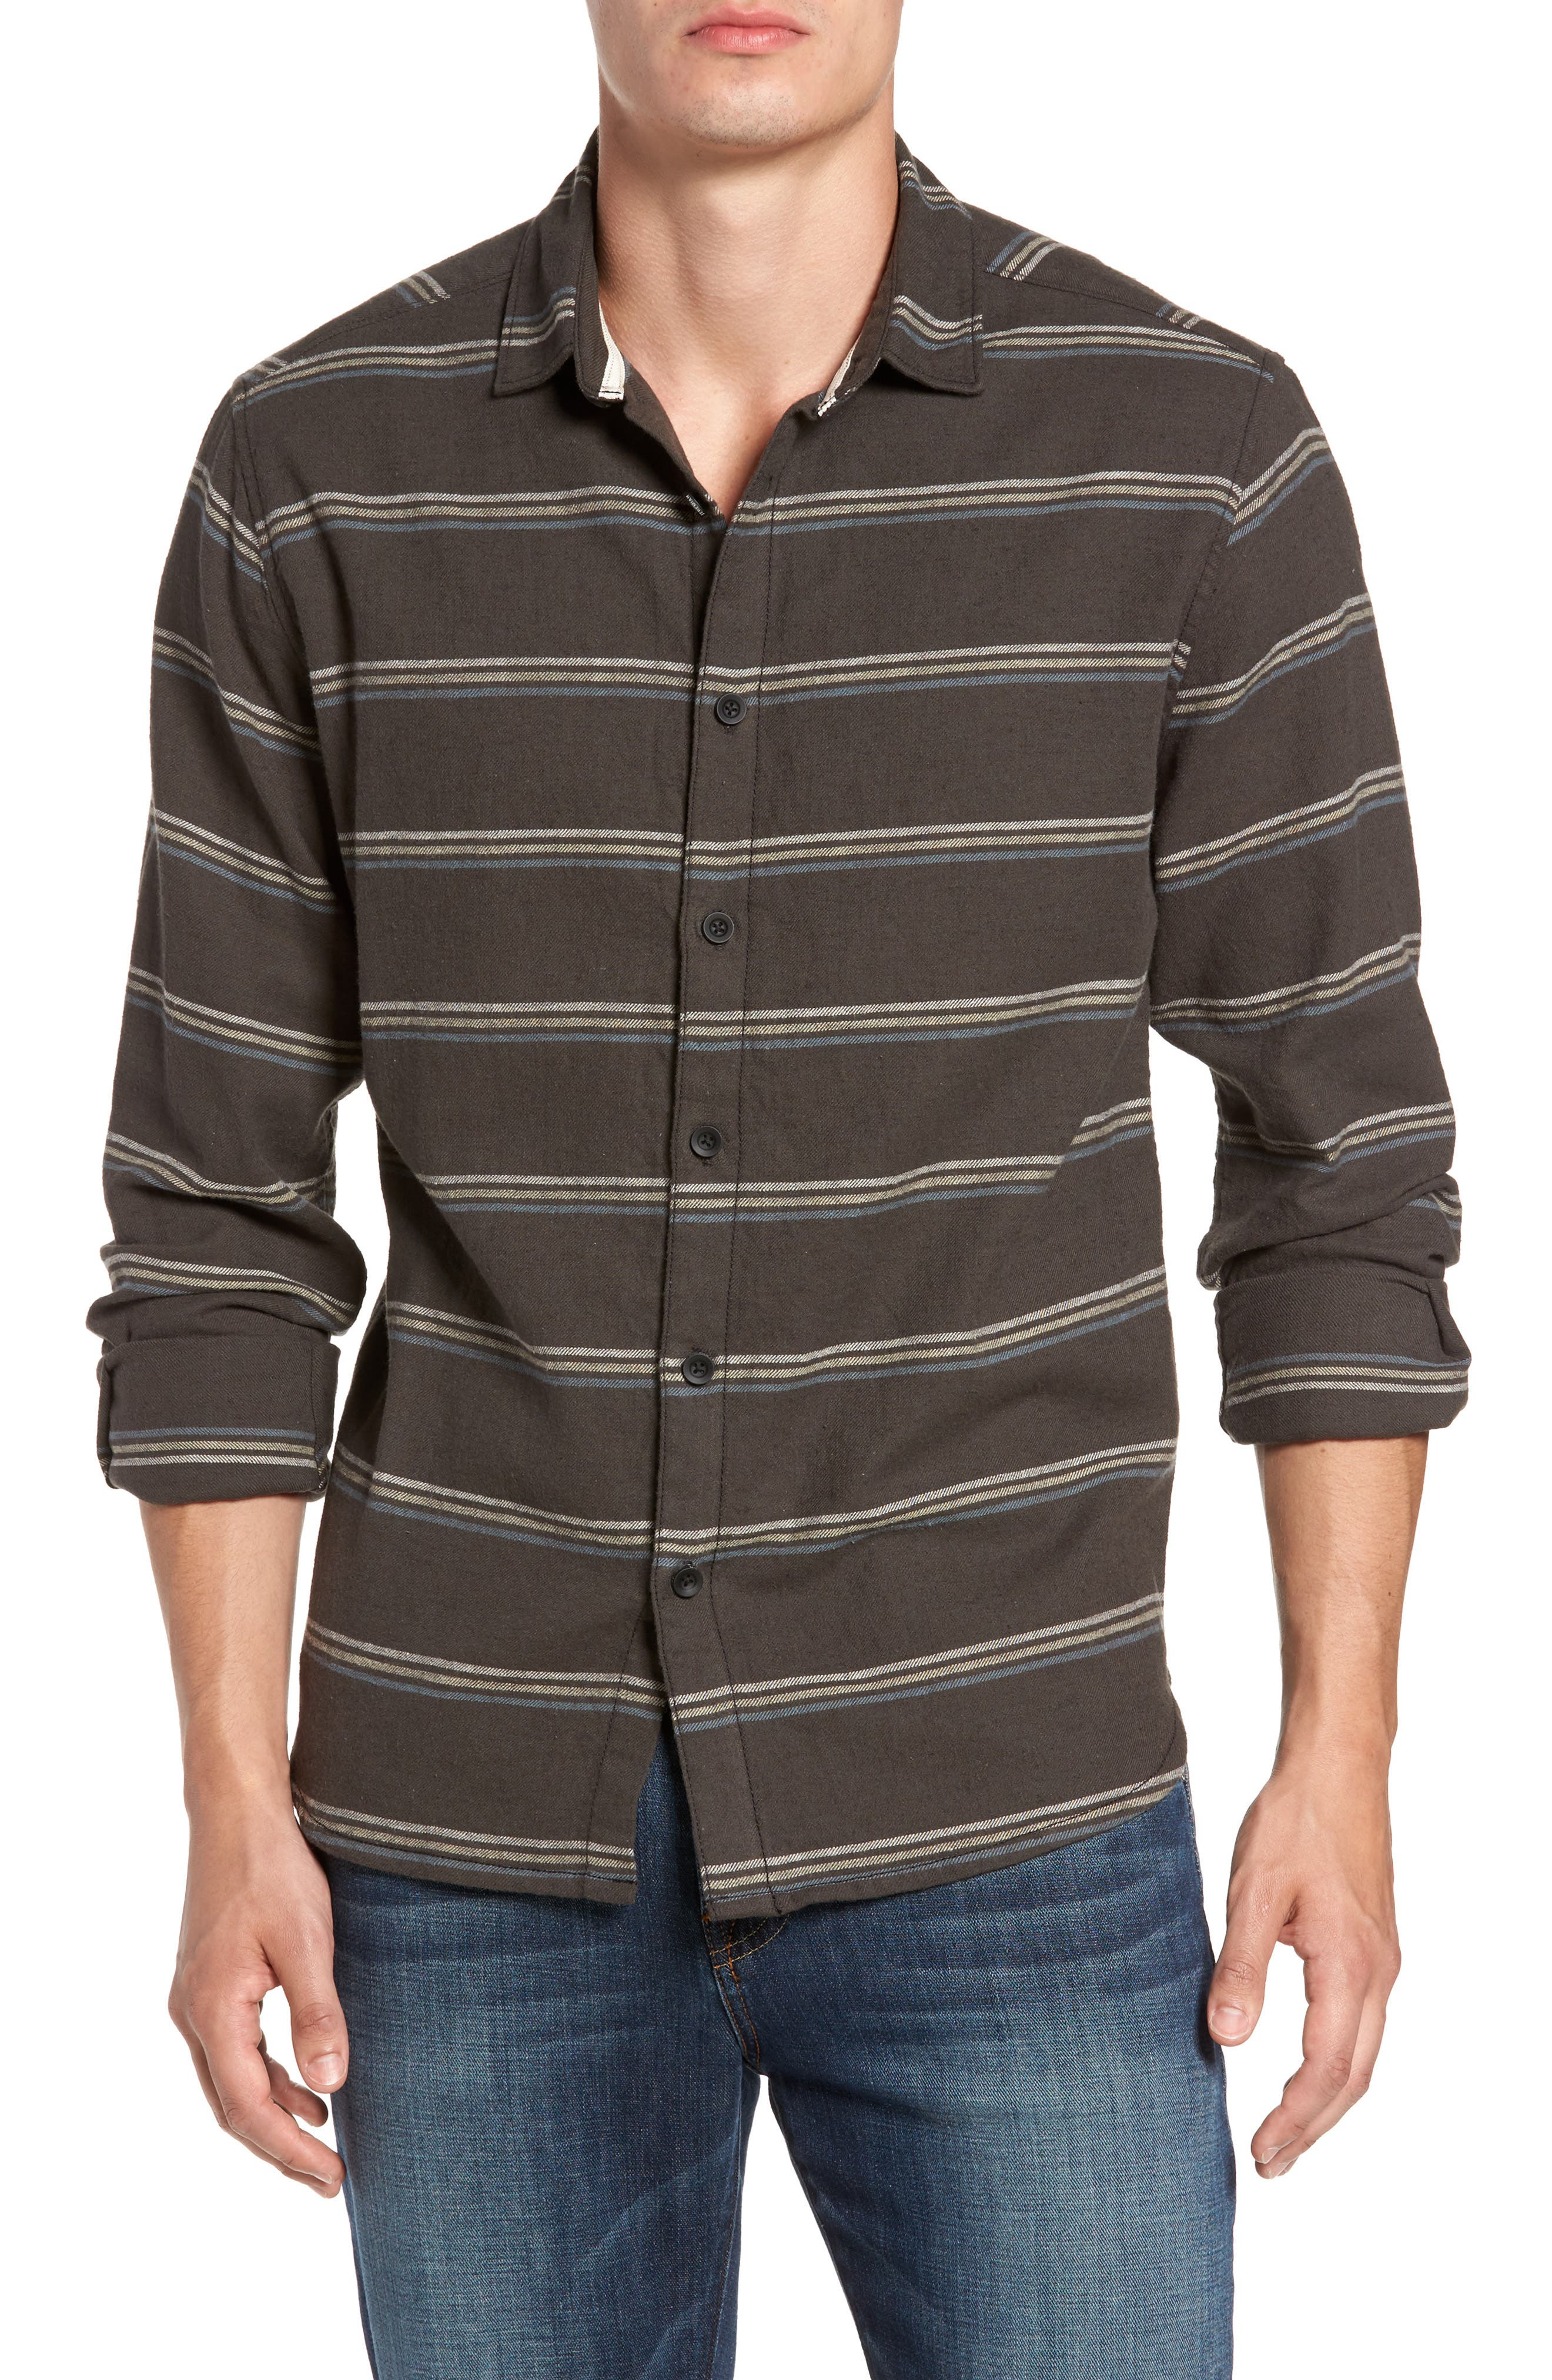 McKinley Stripe Shirt,                             Main thumbnail 1, color,                             002